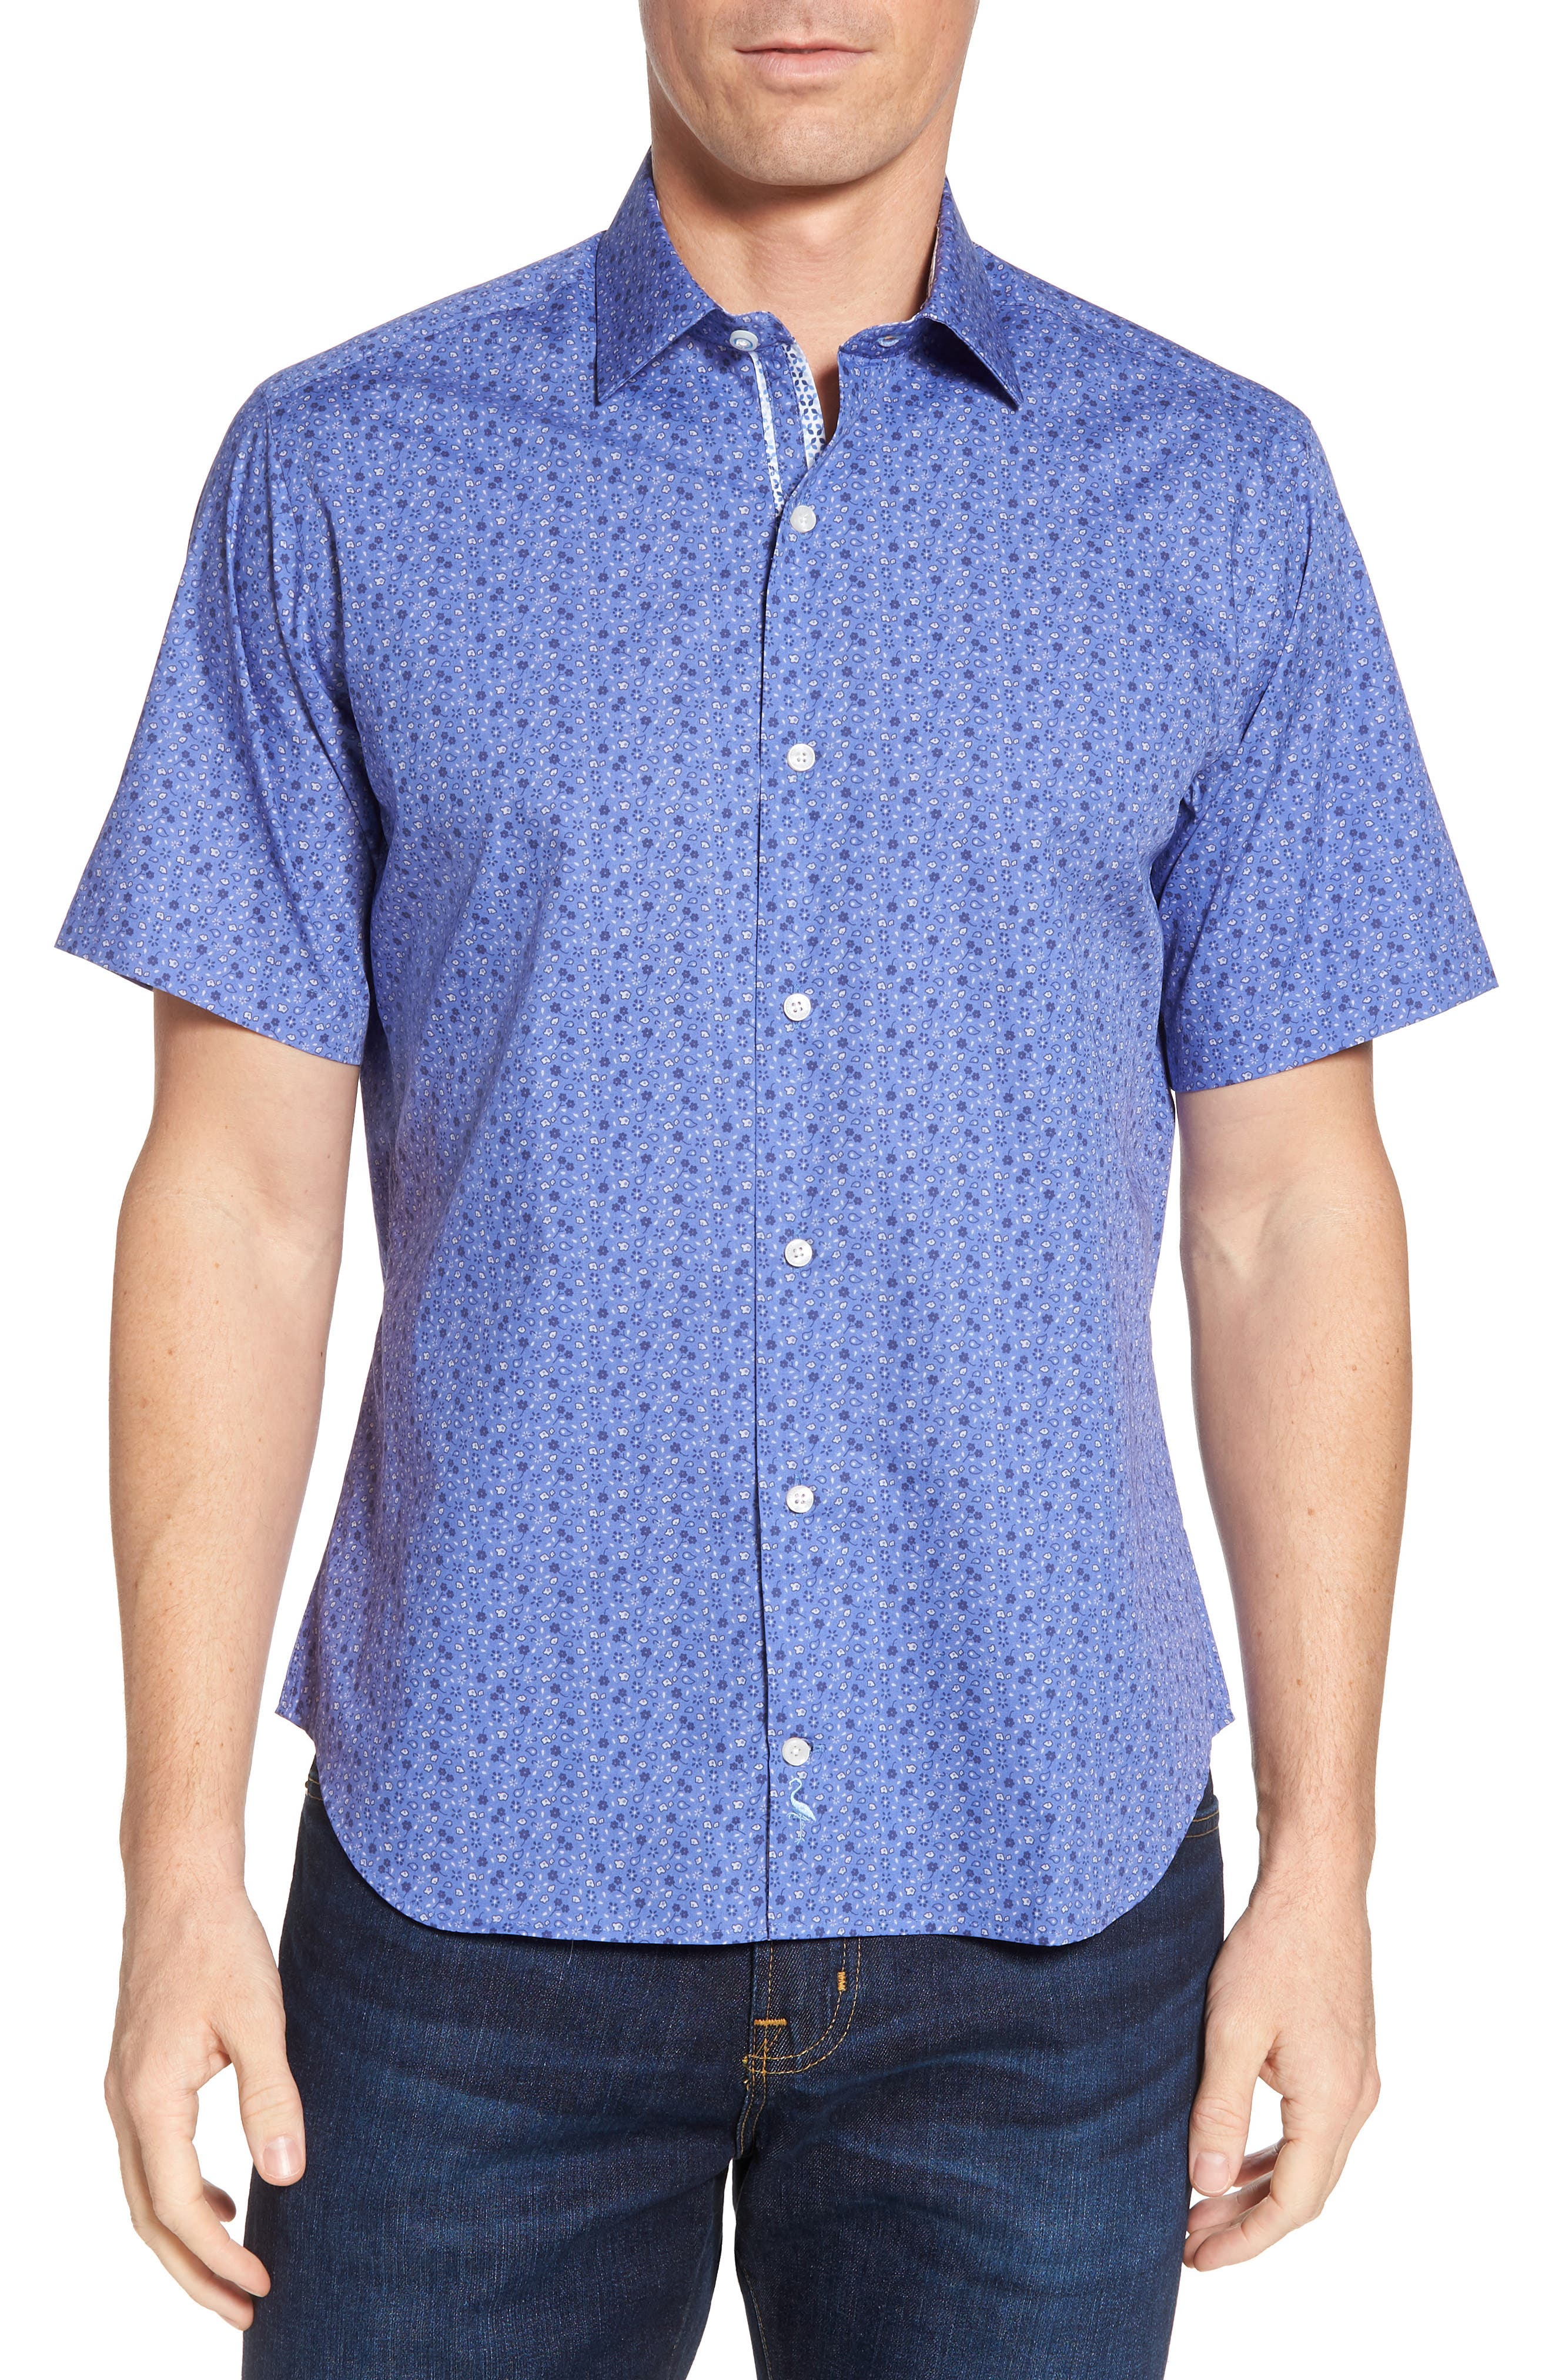 Ballou Regular Fit Floral Print Sport Shirt,                         Main,                         color, Royal